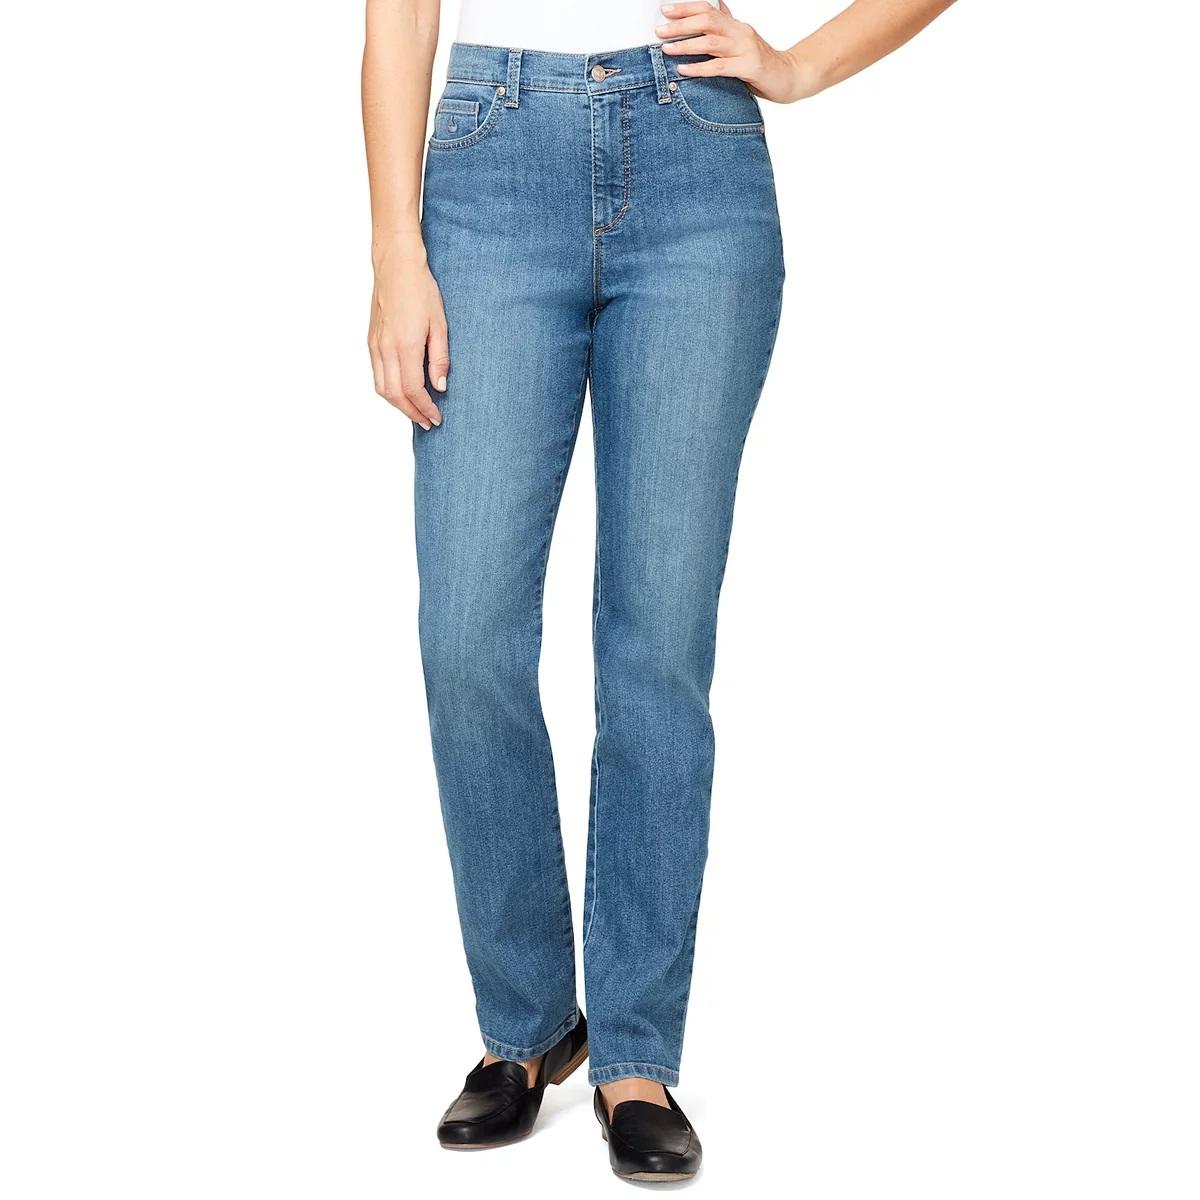 Gloria Vanderbilt Ladies Denim Average Length Jeans - Hartford 6